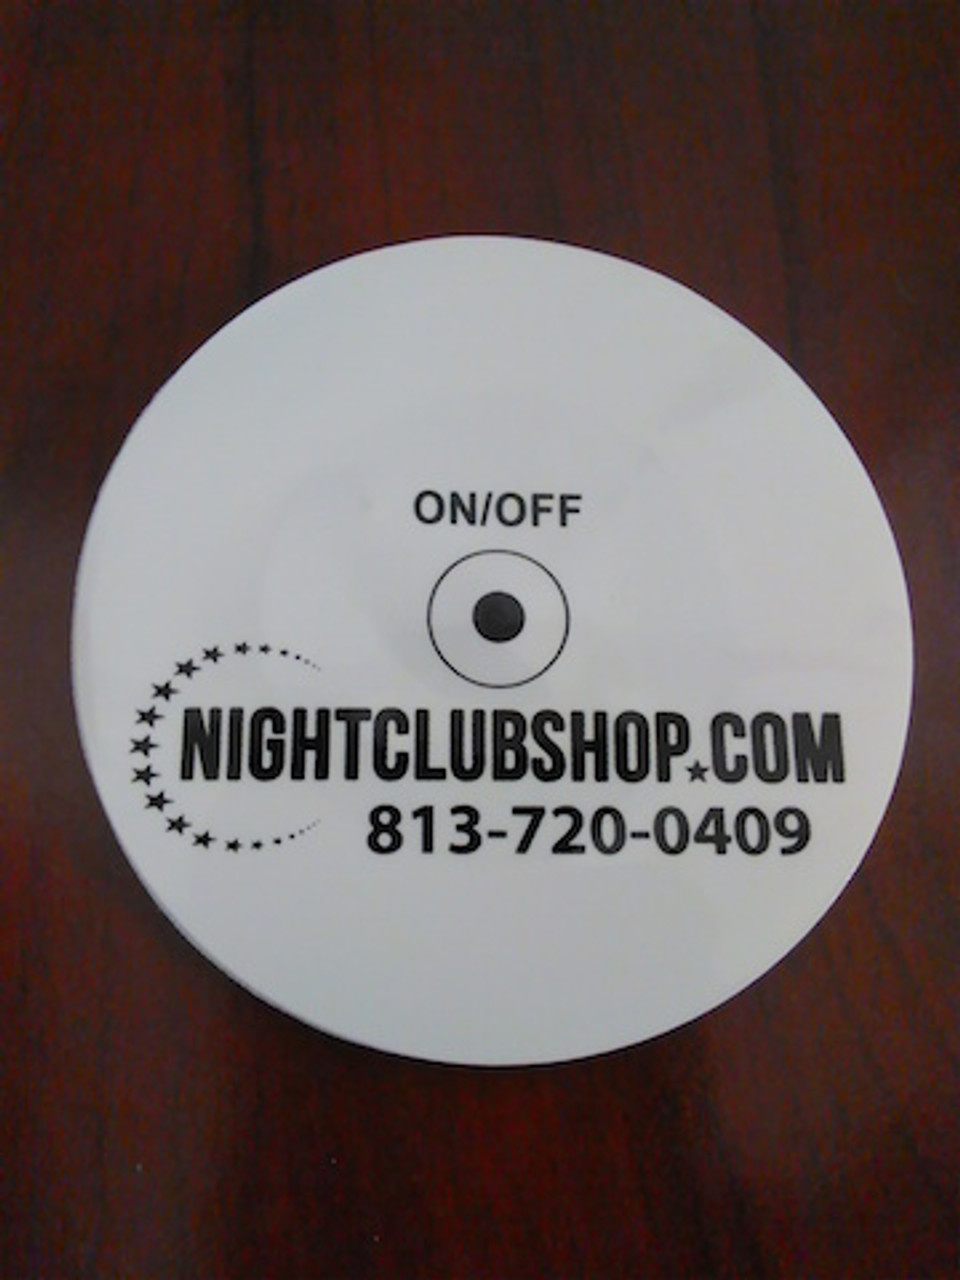 mini-LED-bottle-service-glorifier-nightclub-supplier-supplies-VIP-presentation-light up-glow-presenter-custom-customizable